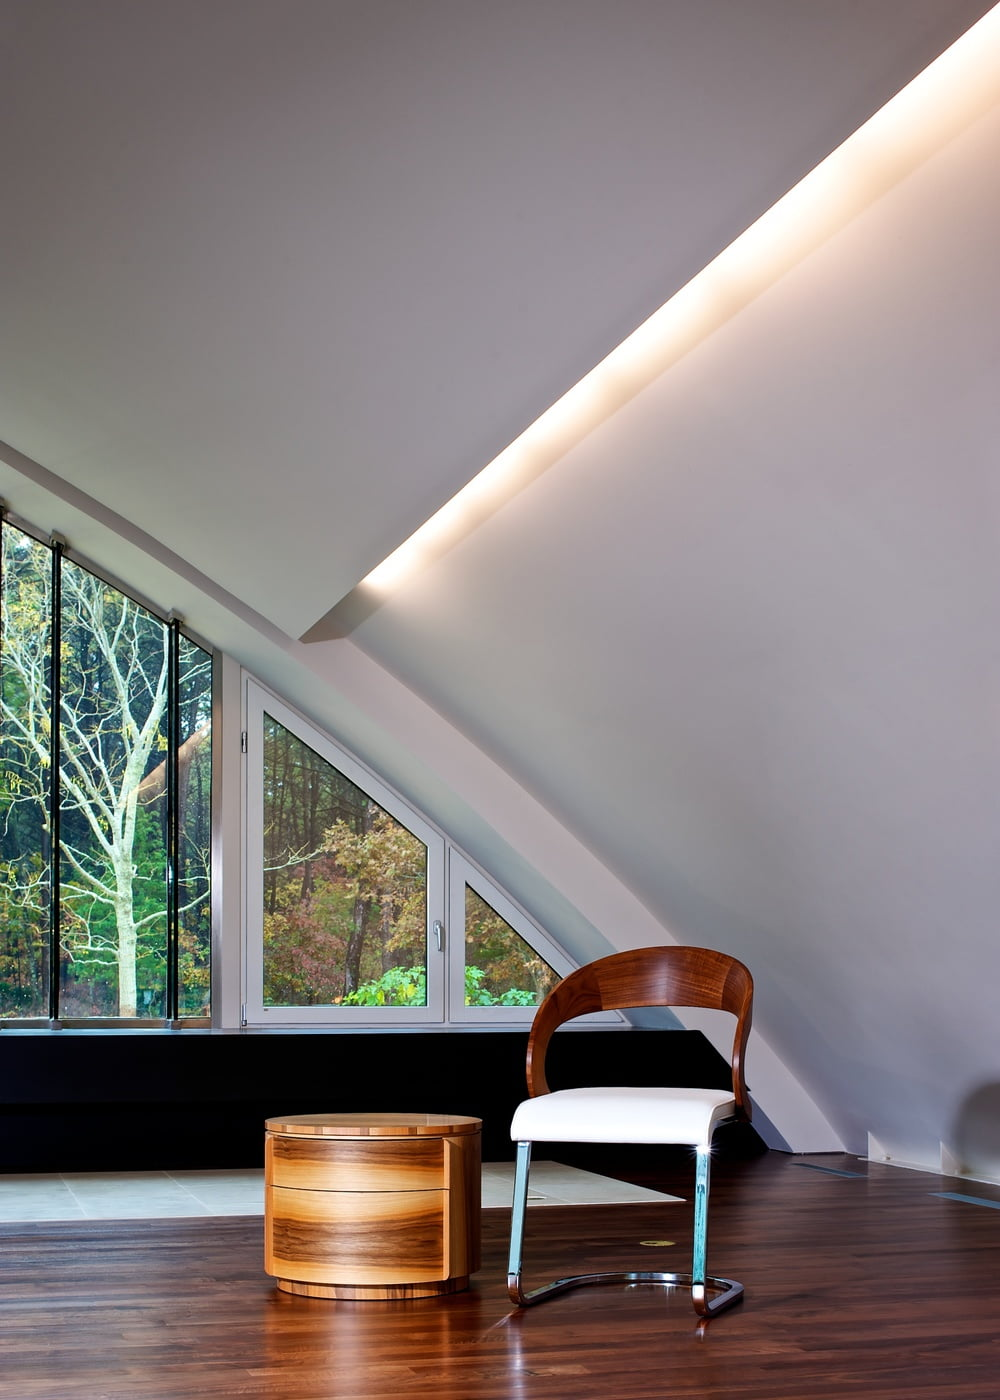 The Arc House by Maziar Behrooz interior